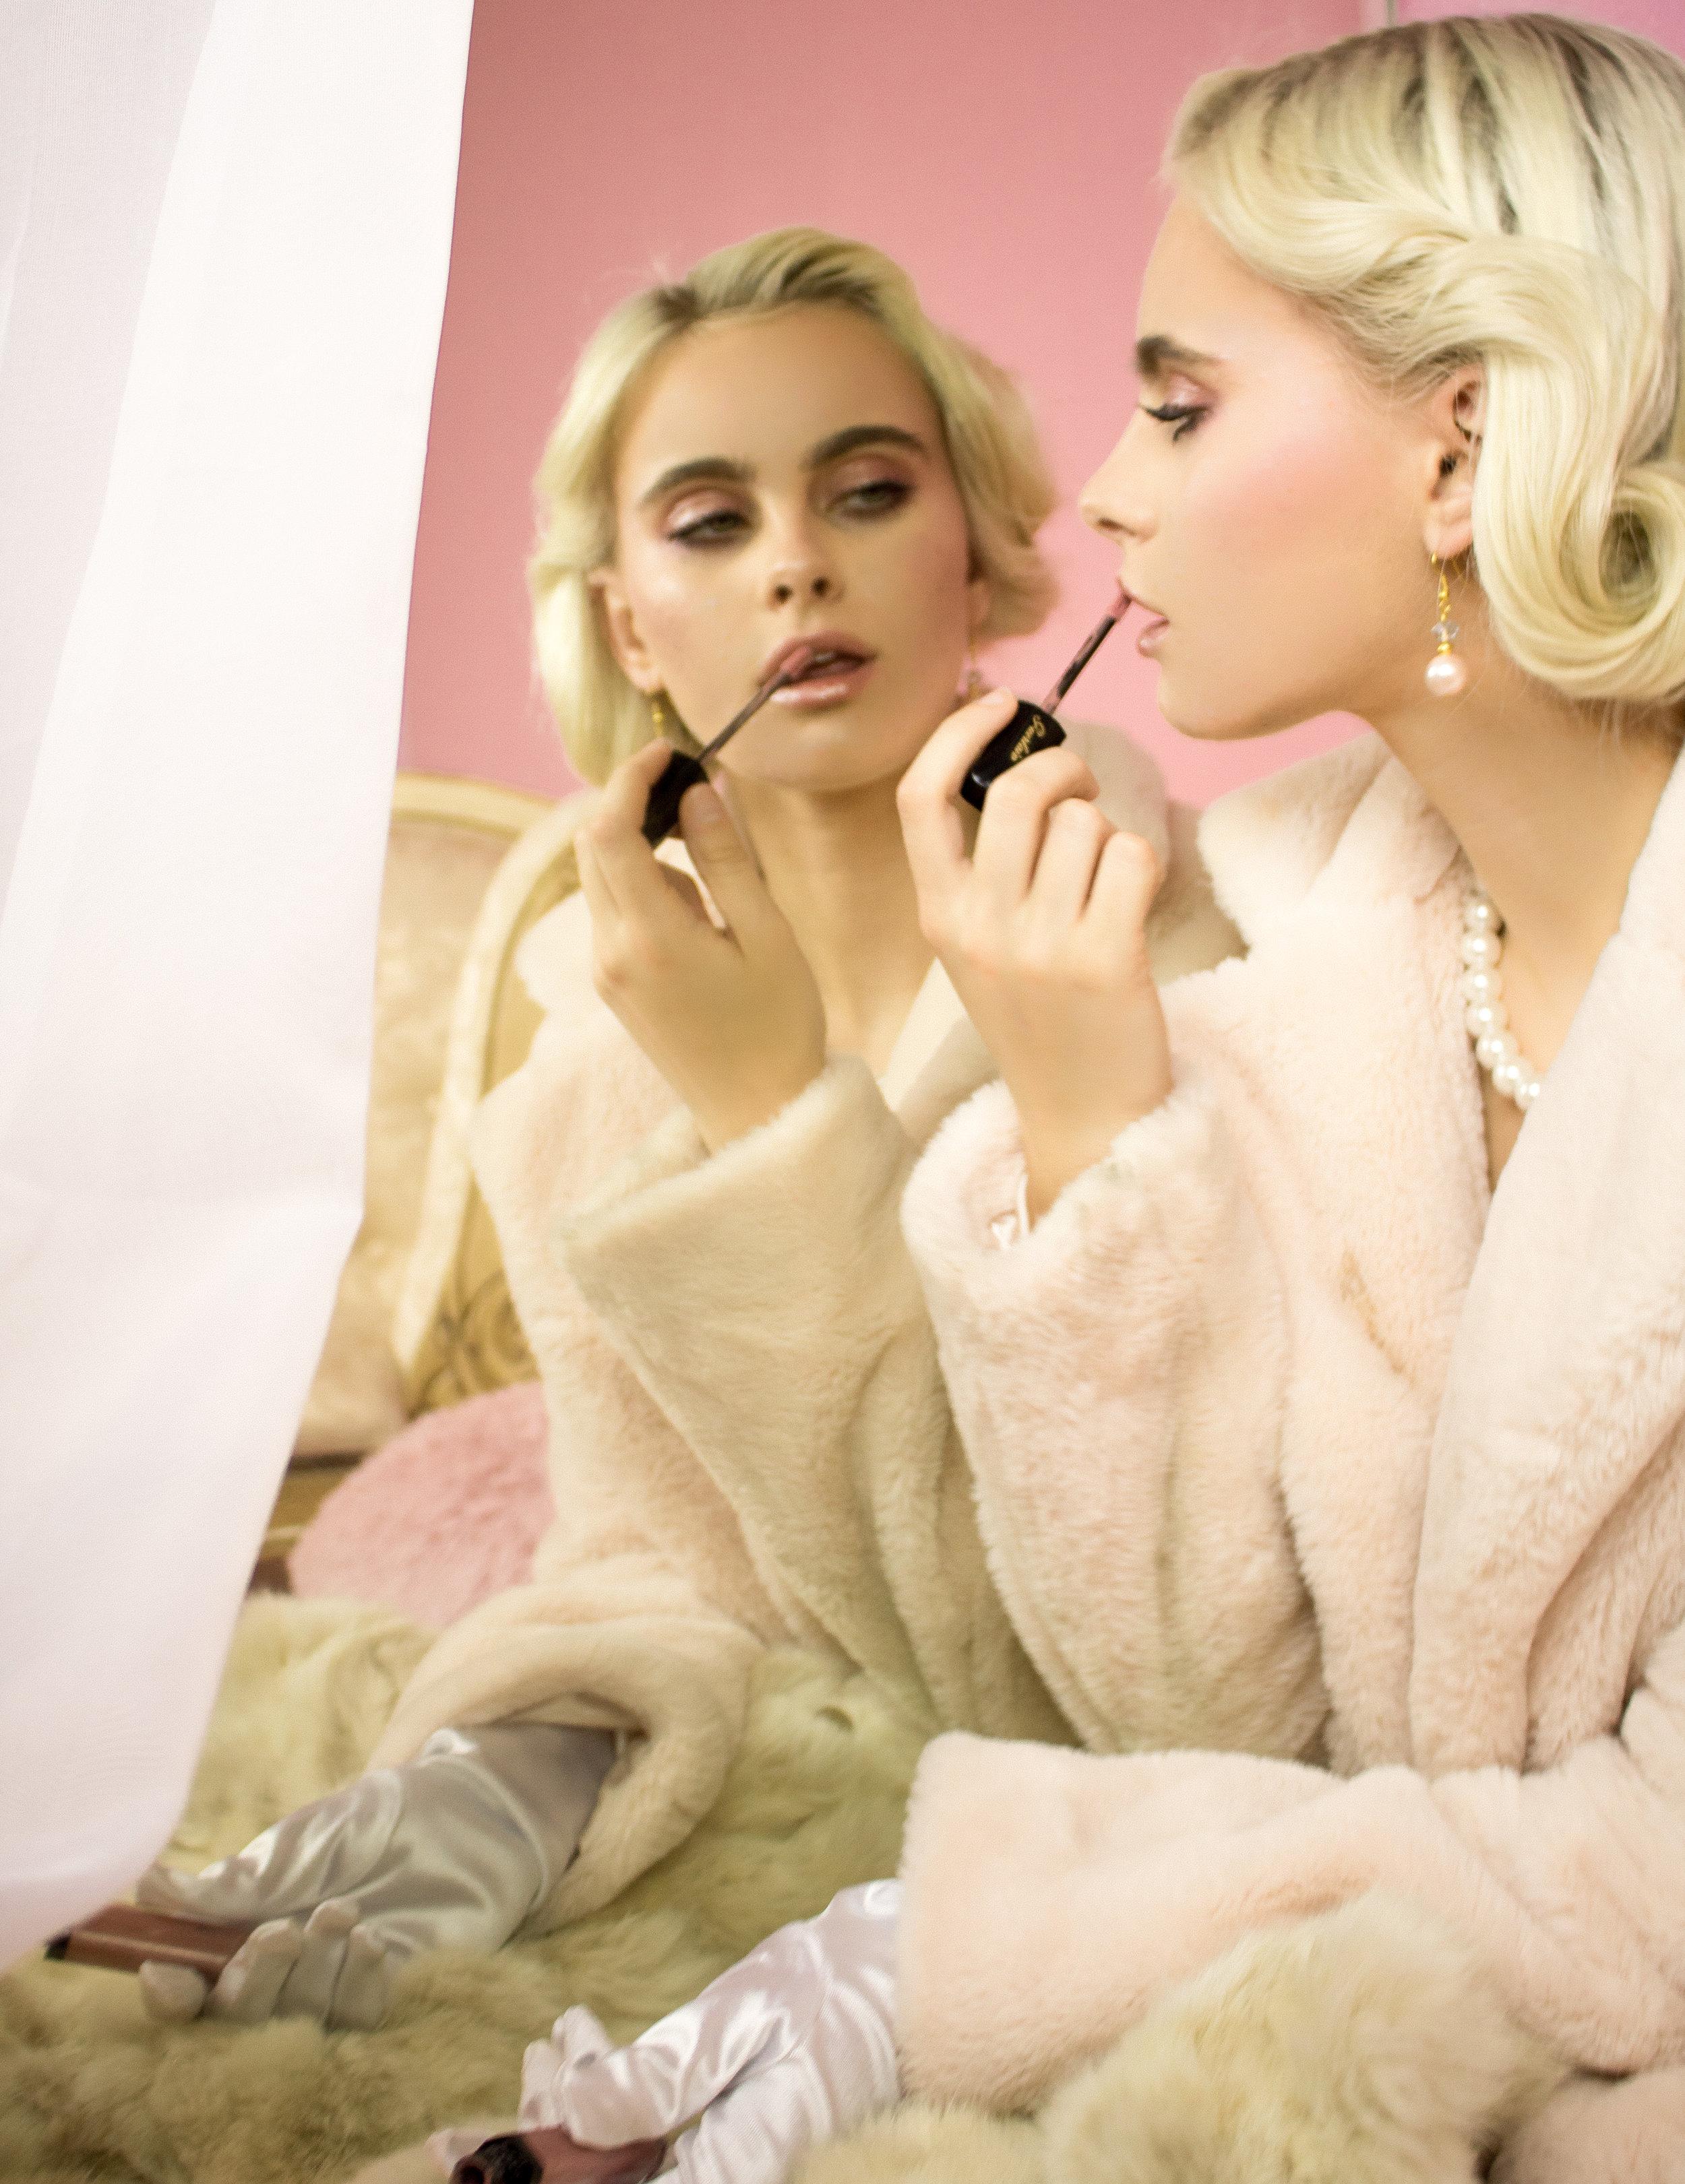 Bri Kumelski  makeup by Adele Garcia  styled by myself